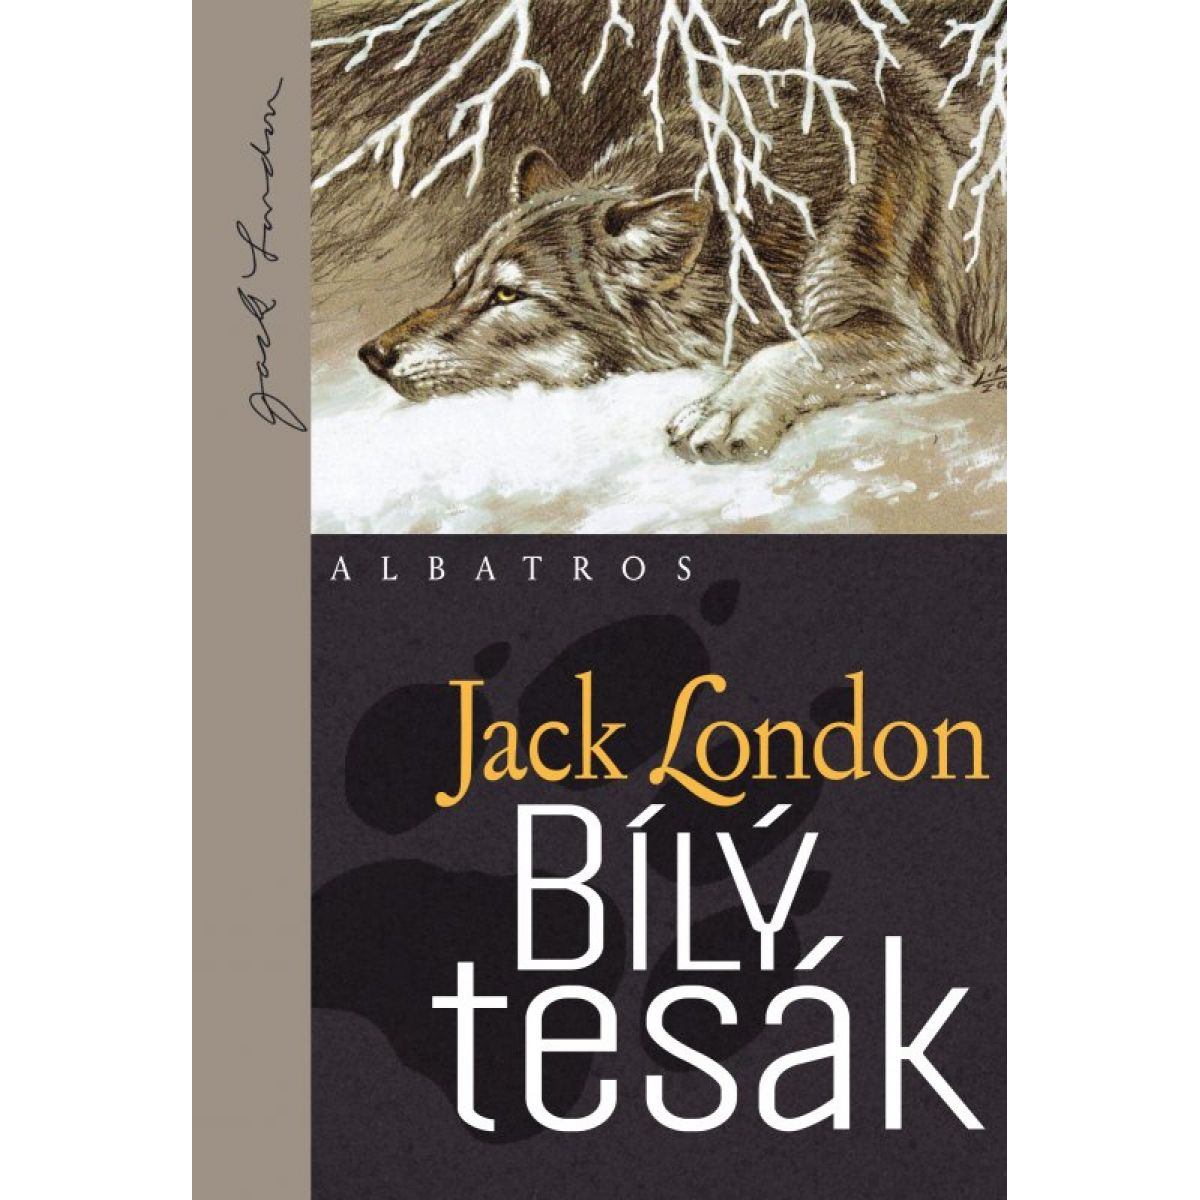 Biely tesák - 13. vyd. - Jack London